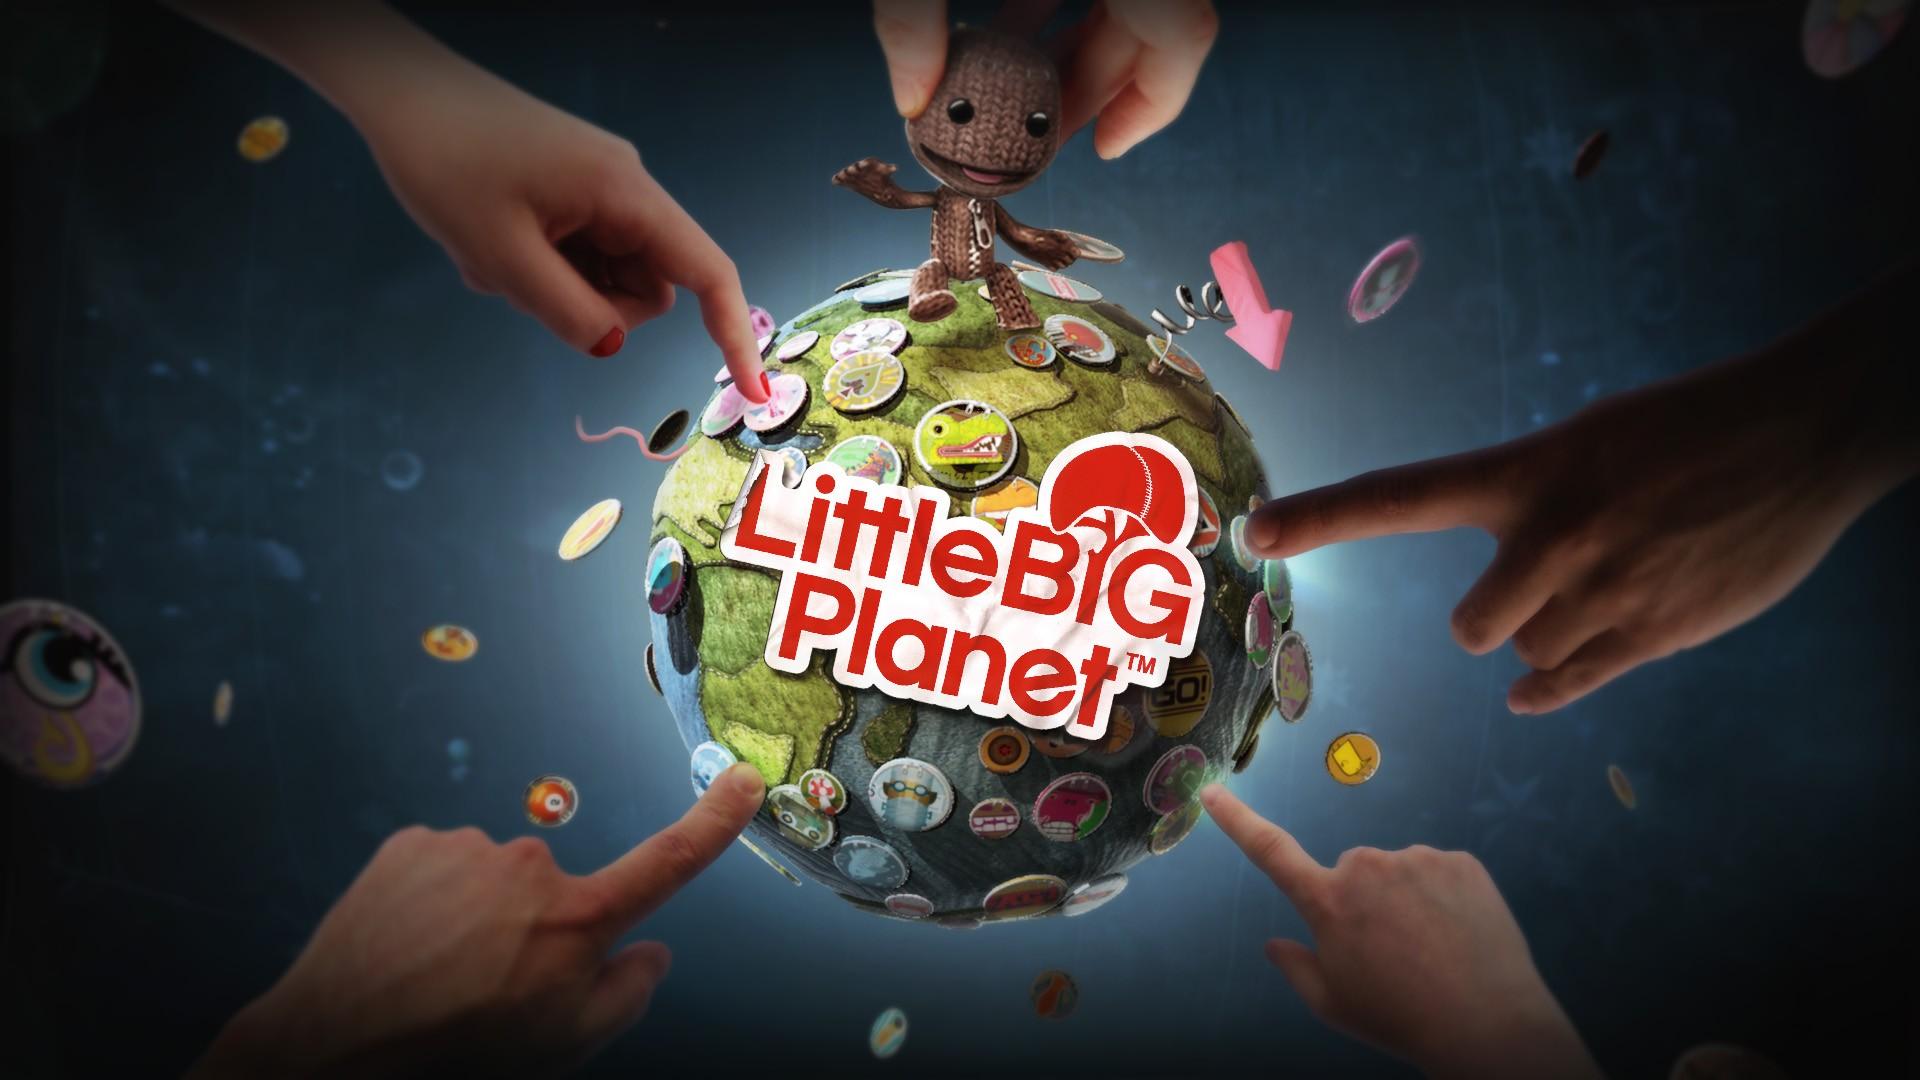 LittleBigPlanet 3 Demo Reveals The Return of Sackboy